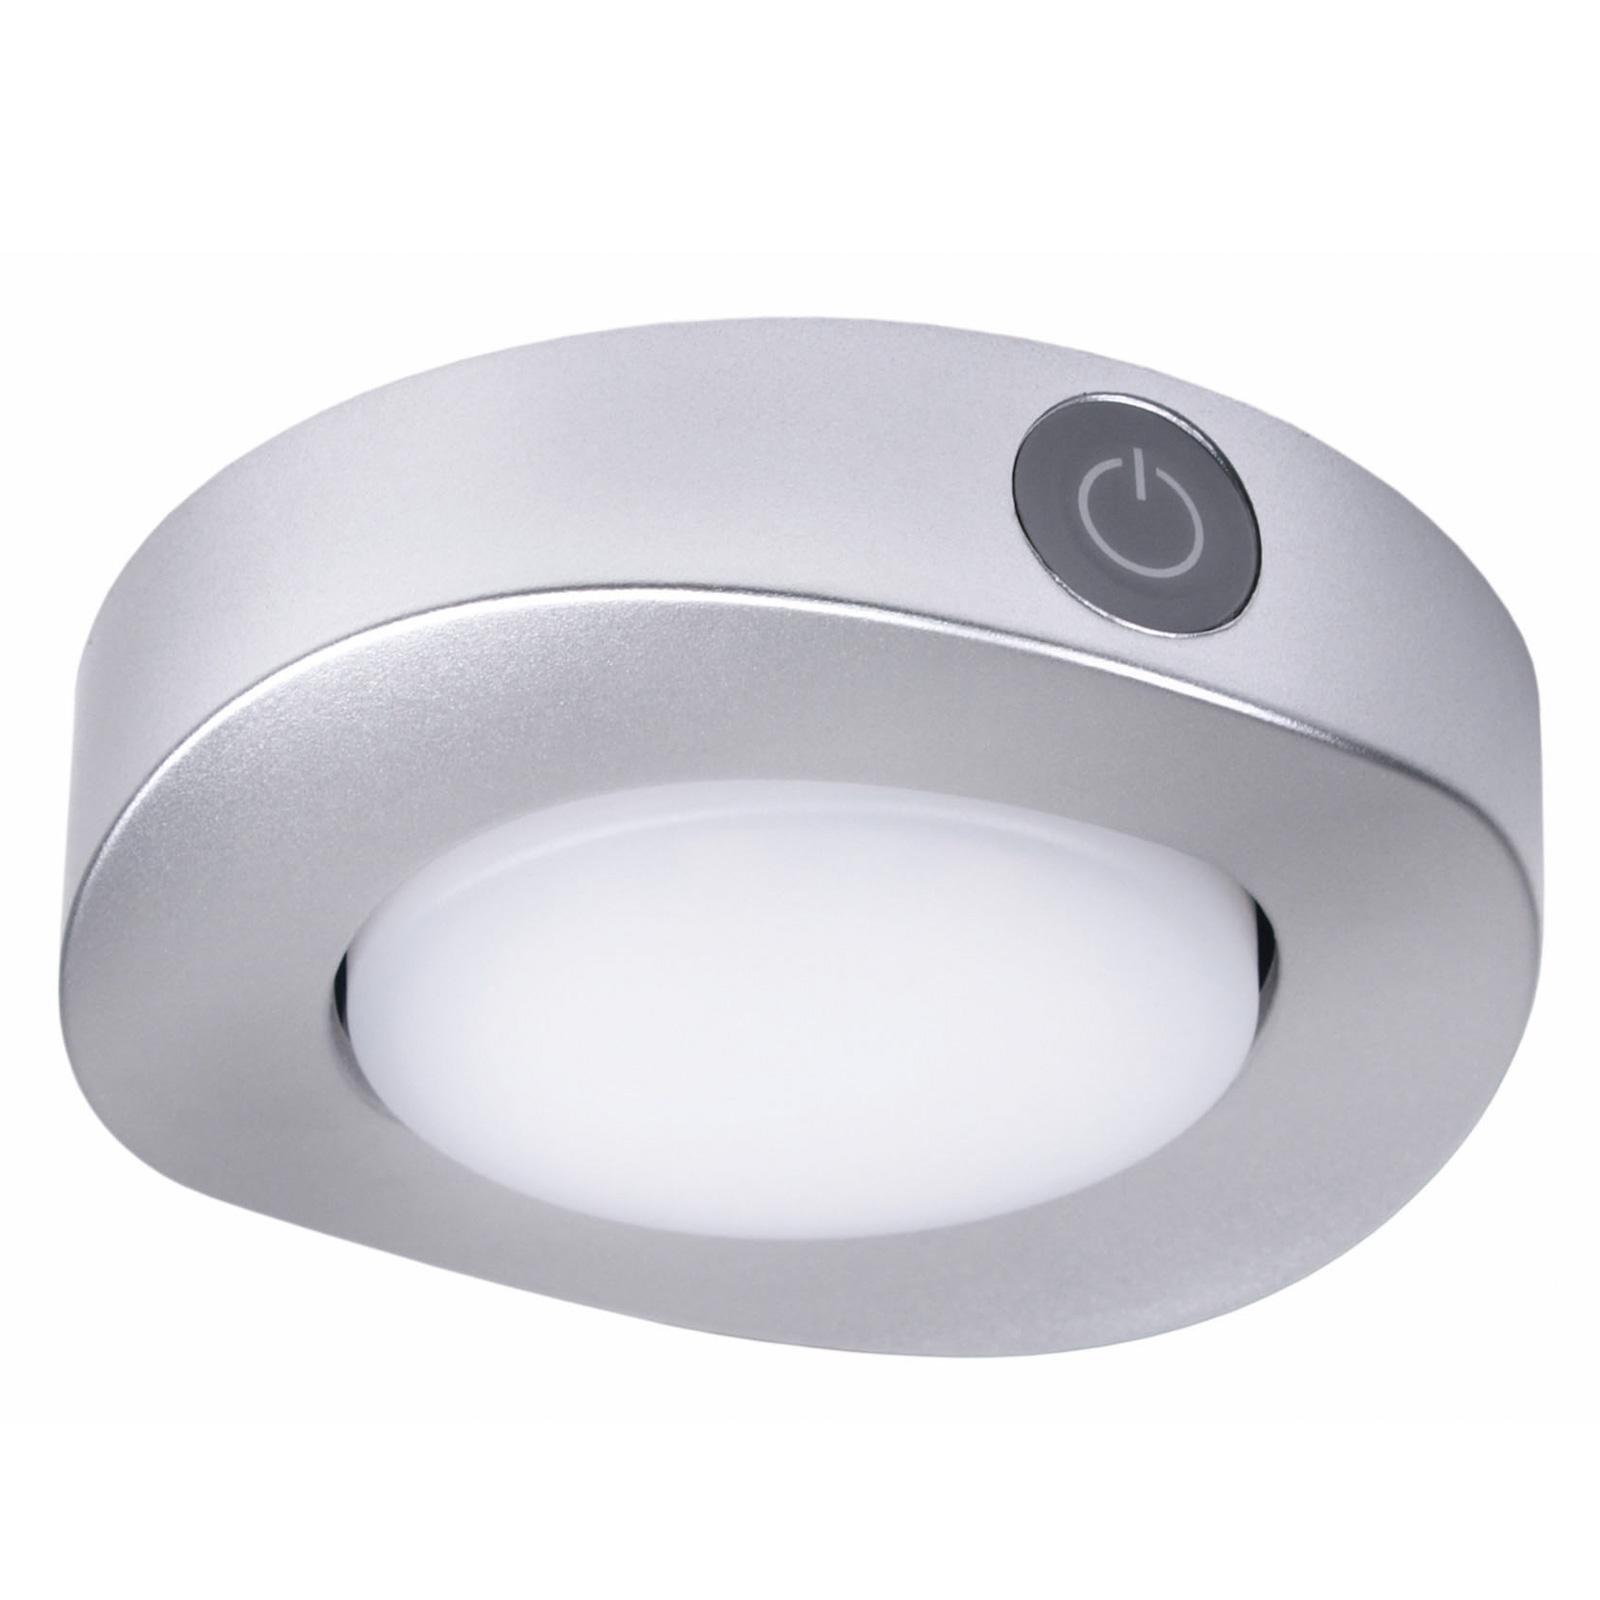 LED Deckenleuchte 6xweiße + 6xblaue SMD LEDs, Ø97mm, 2W, 120lm